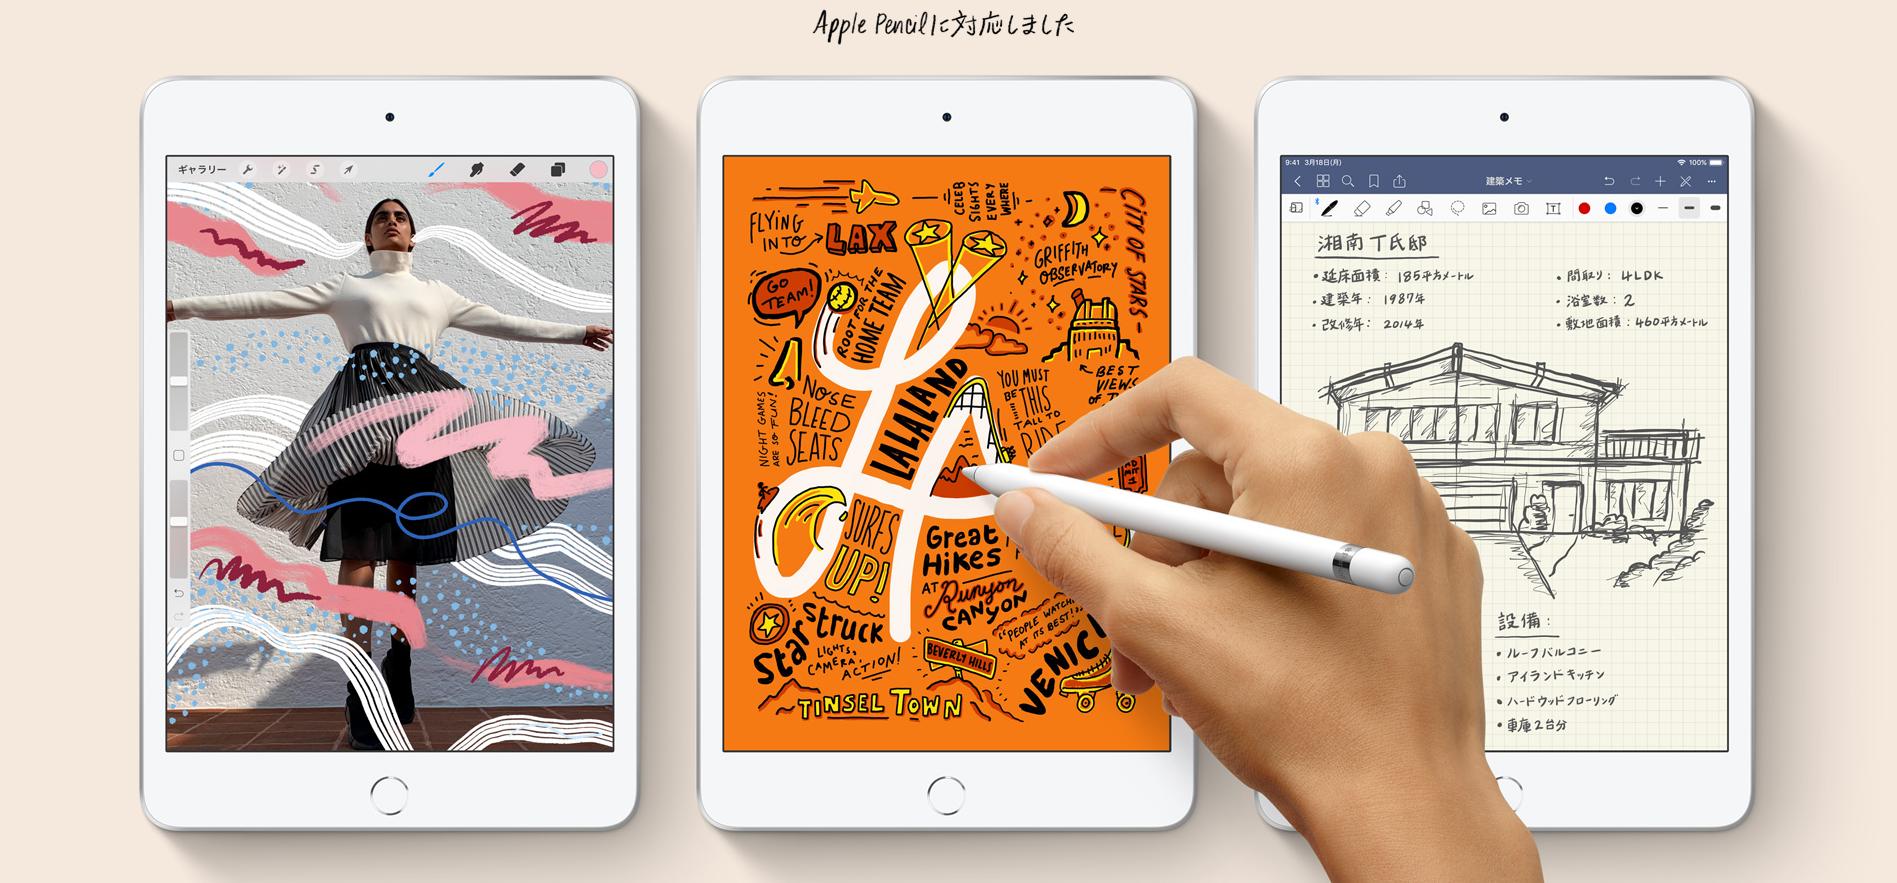 iPad mini 4から新iPad miniへ切り替えるか否か